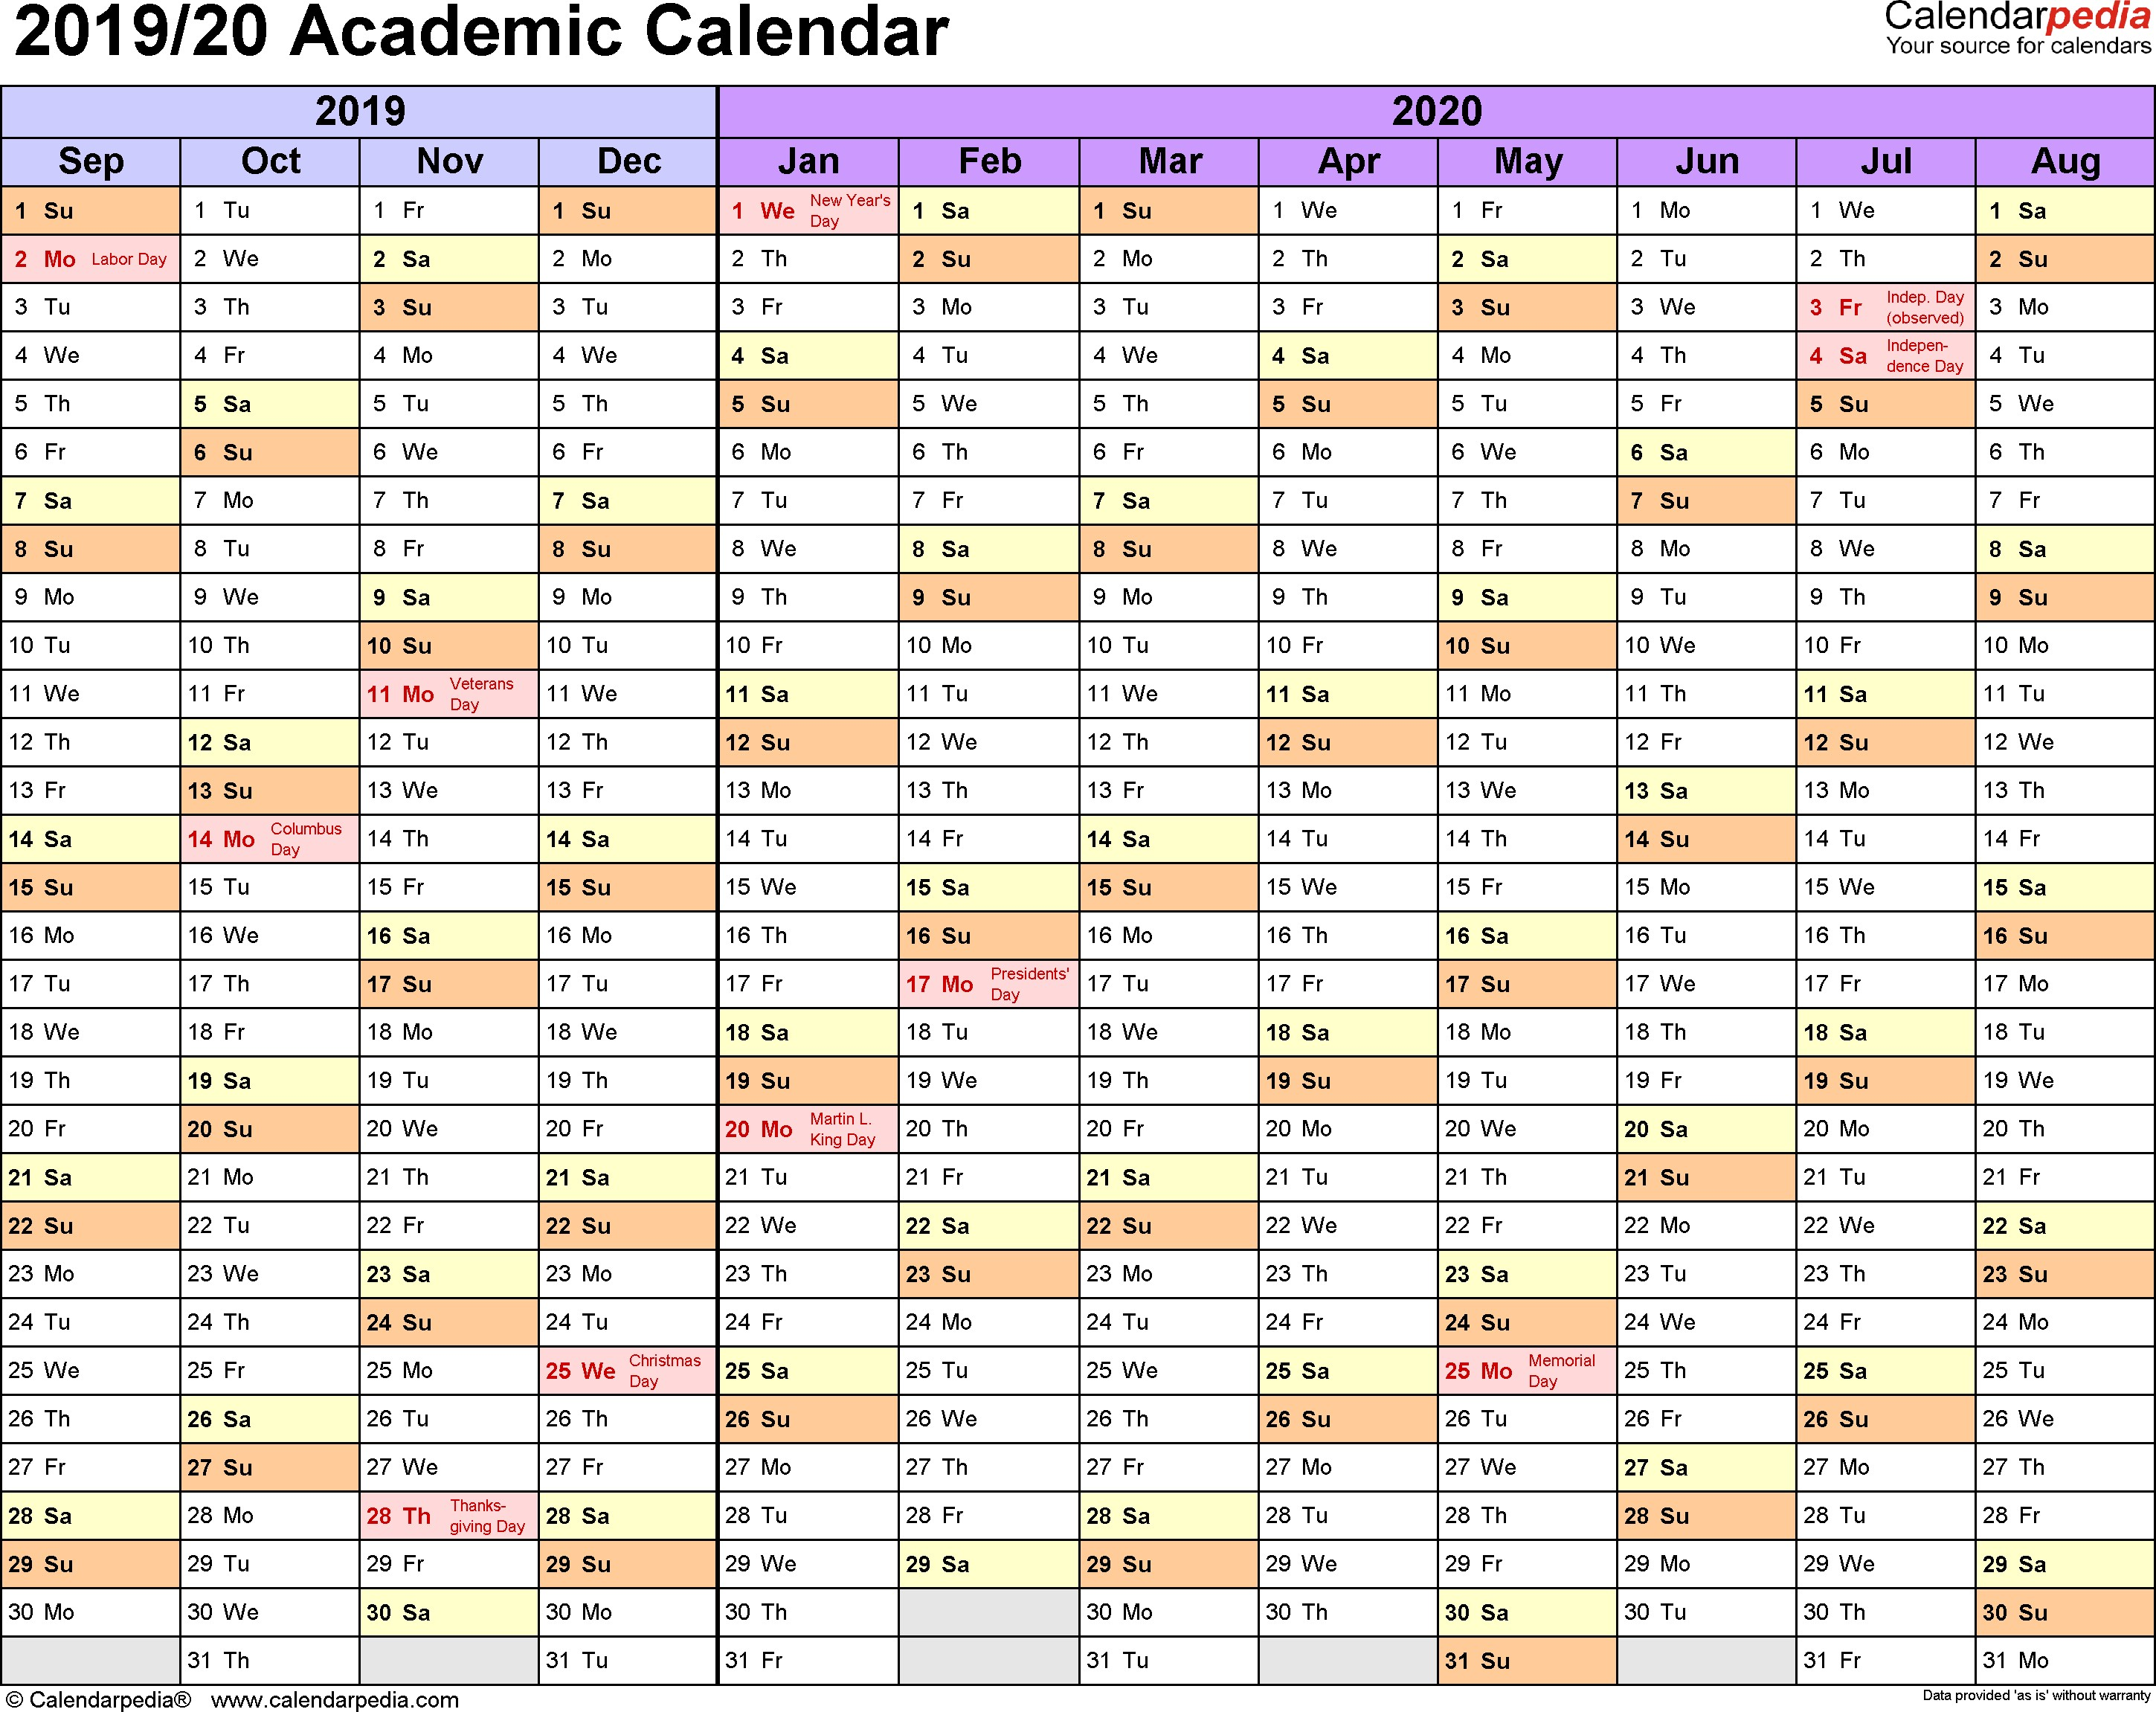 Printable Academic Calendar 2020 Academic Calendars 2019 2020 Free Printable Excel Templates